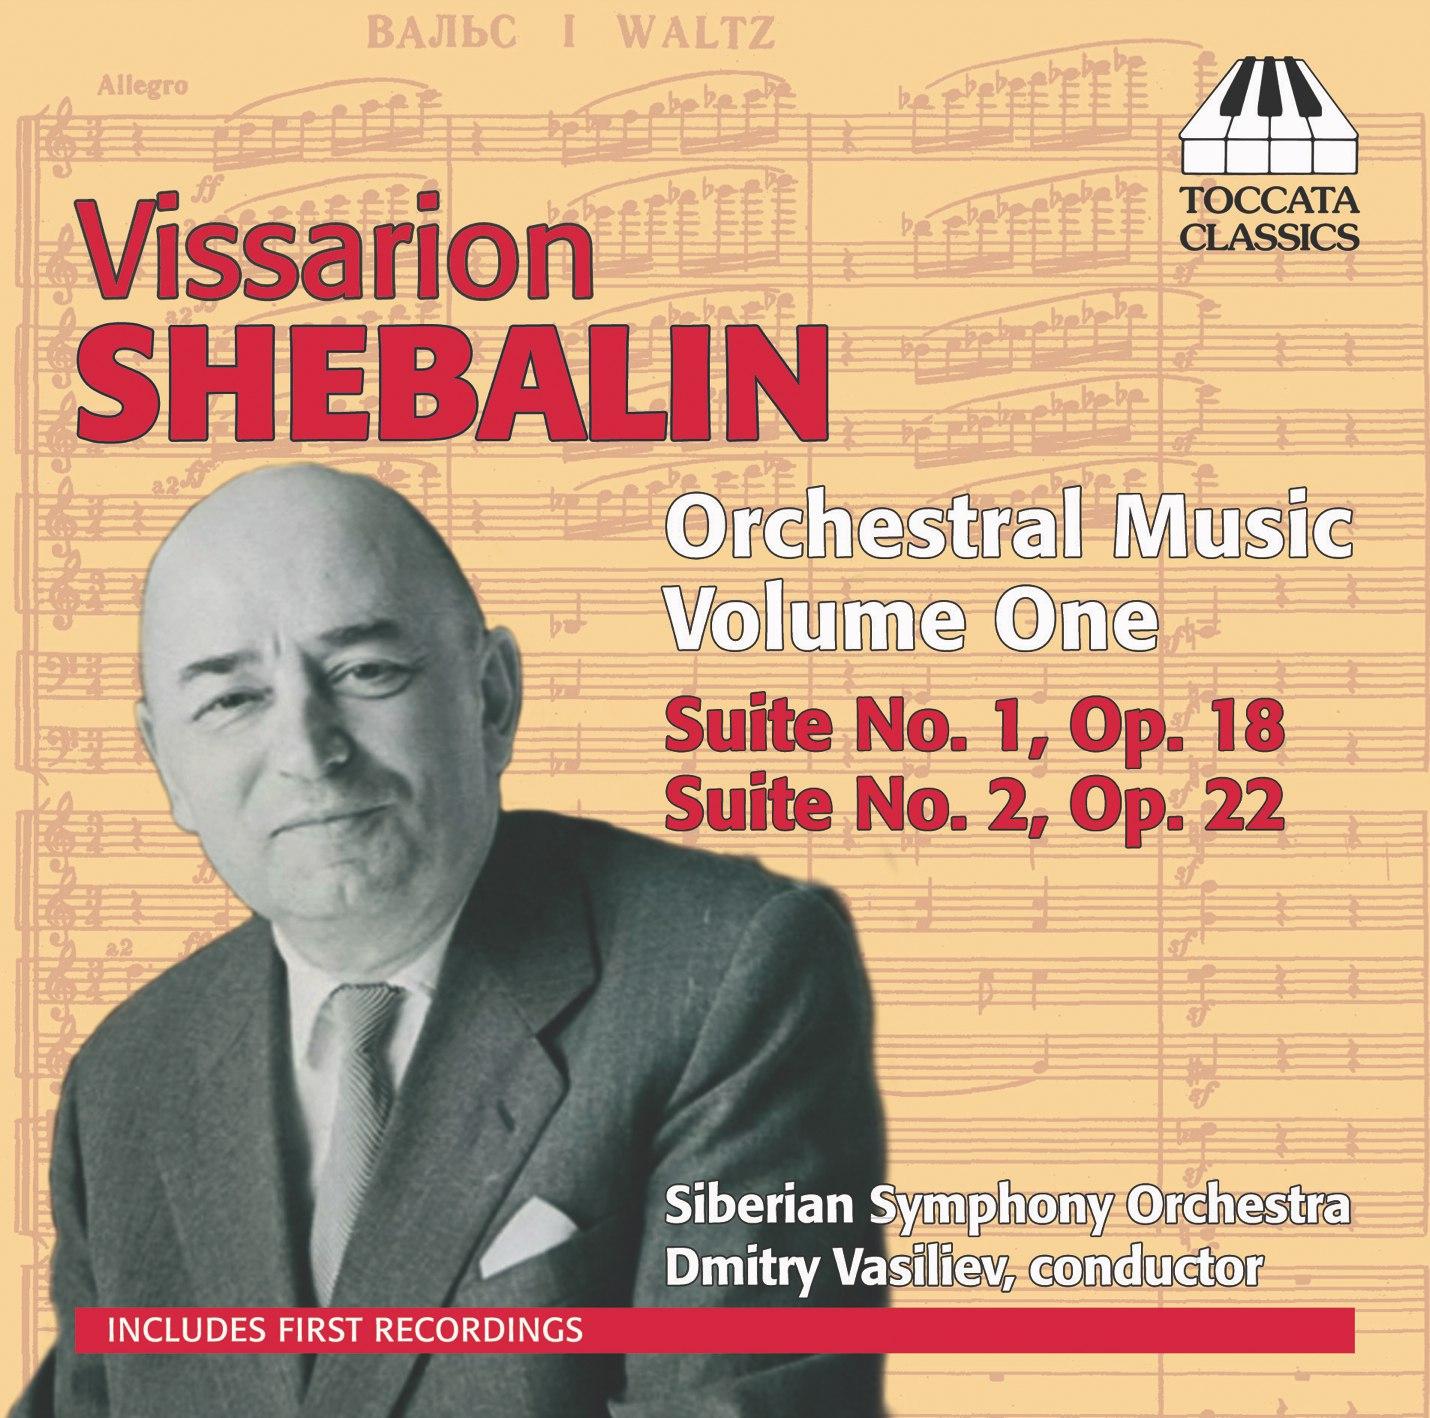 Vissarion Shebalin: Orchestral Music